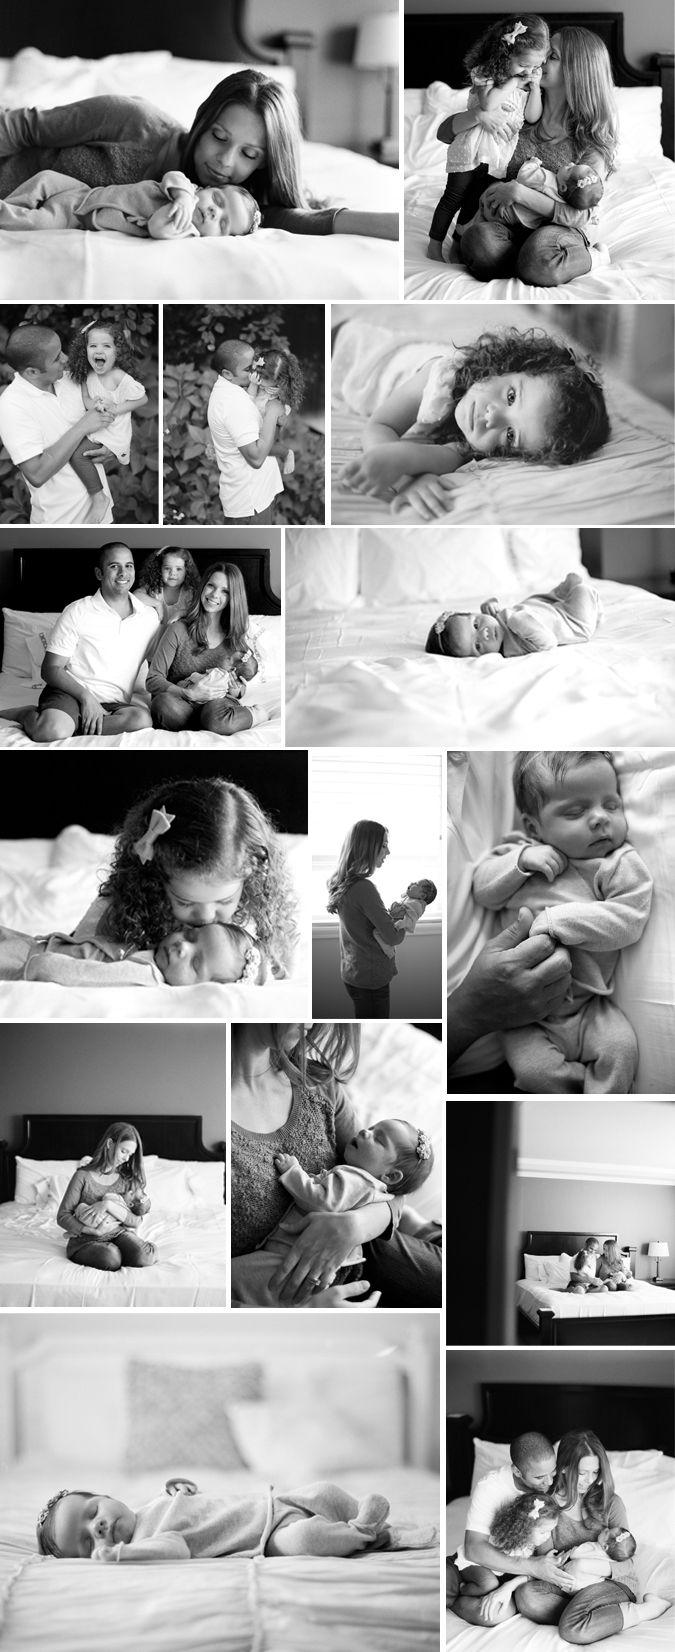 : Newborns Pictures, Photo Ideas, Newborns Photos, Newborns Baby Photos Ideas, Photos Shoots, Newborn Baby Photos, Families Photos, New Baby, Baby Photography